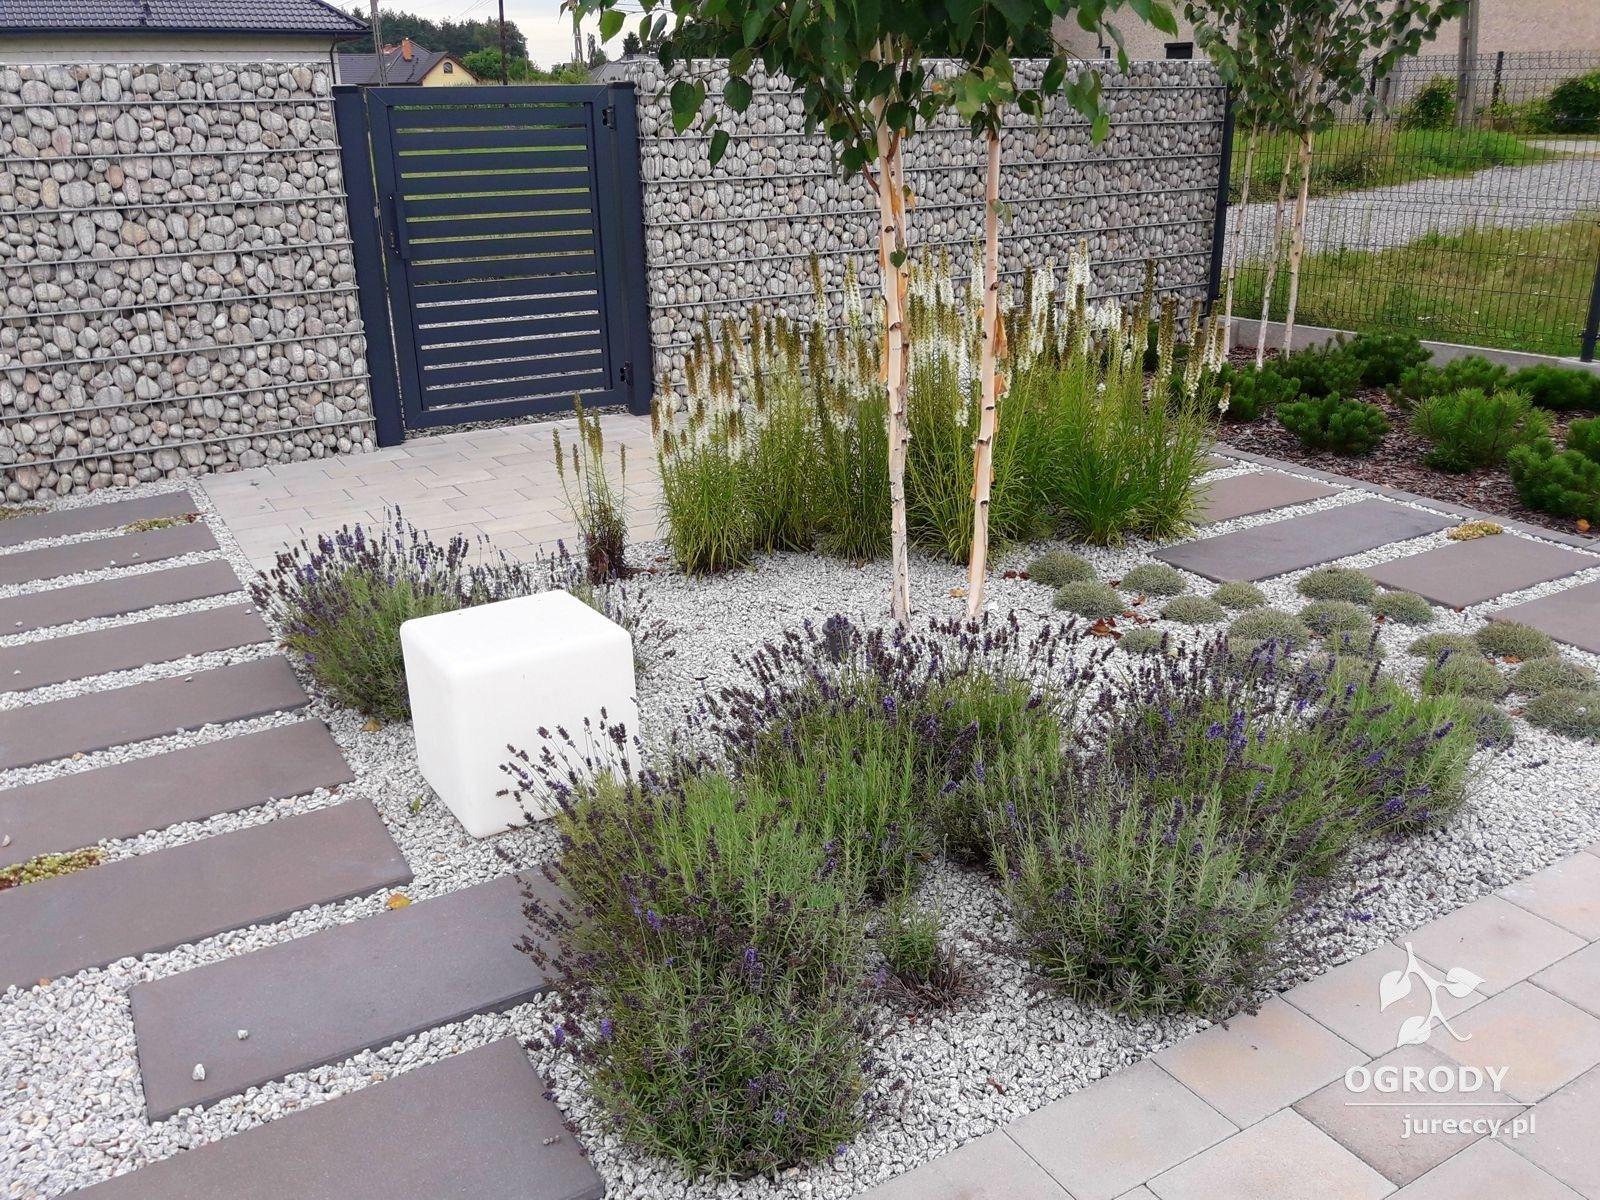 Garden katarzyna bacia pinterest for Gartengestaltung joanna